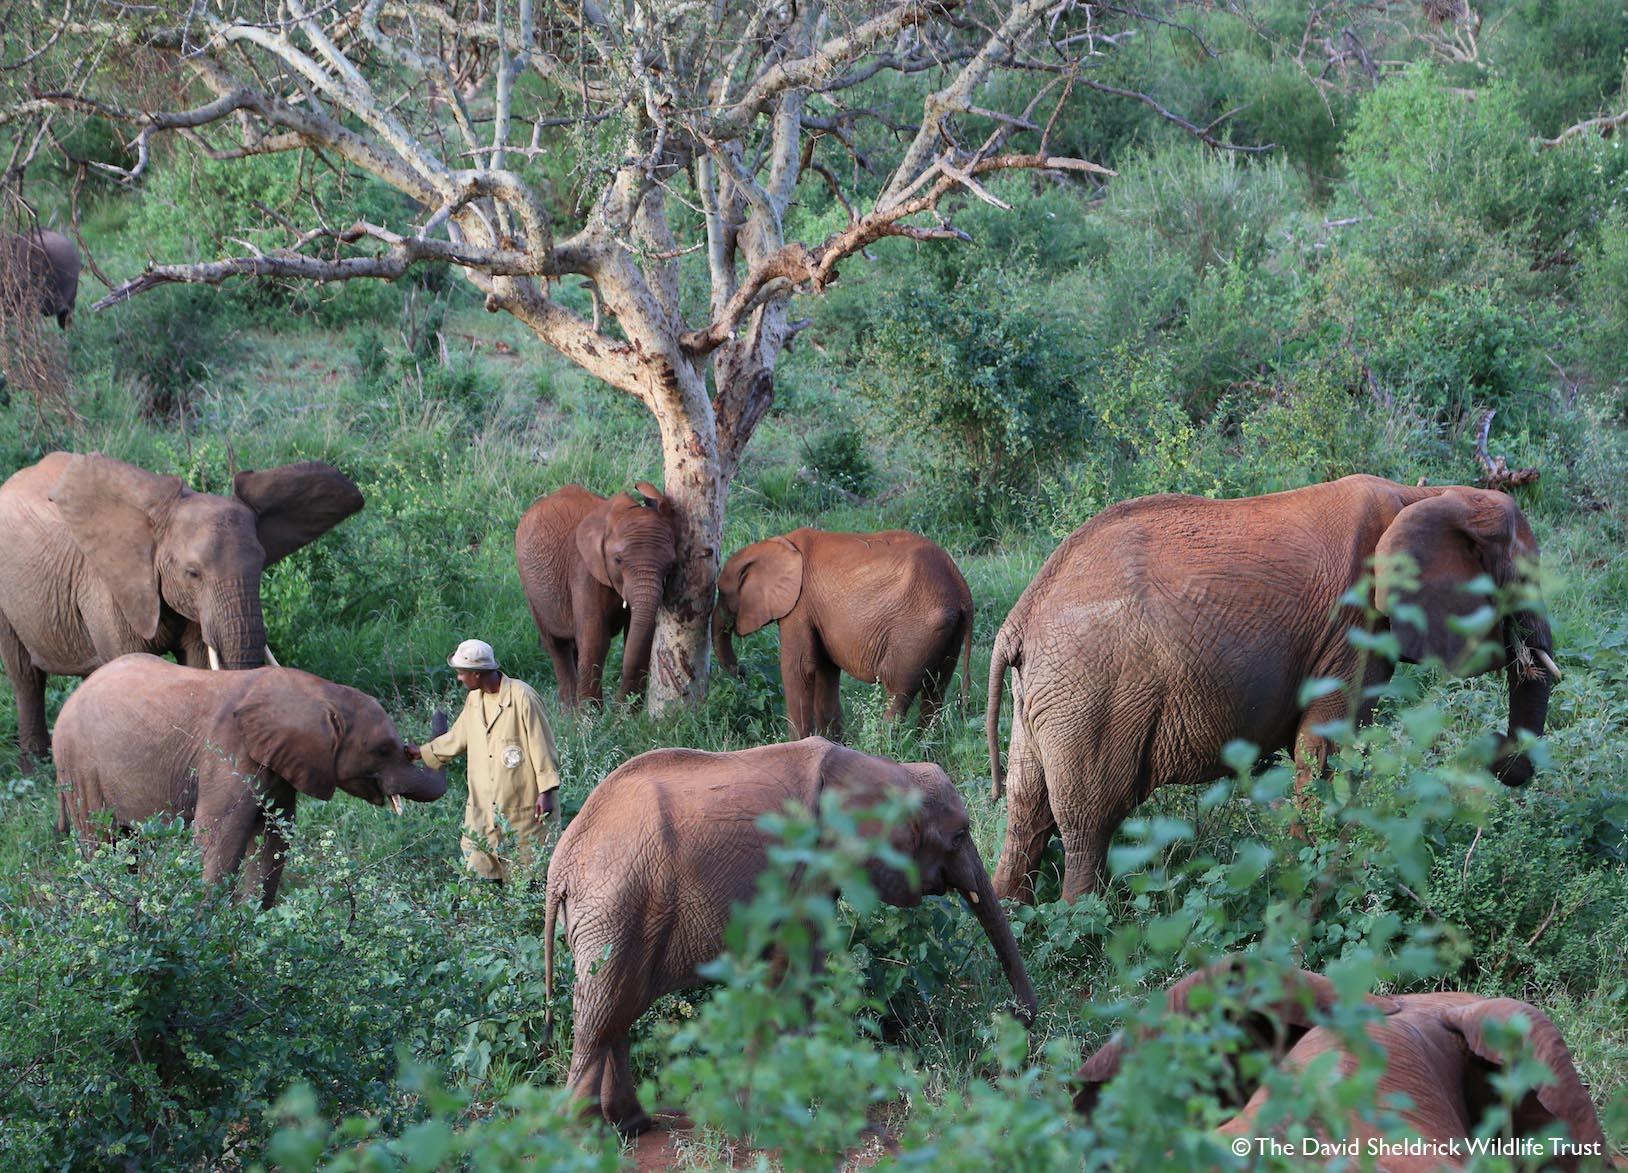 Older orphaned elephants explore Ithumba Reintegration Unit